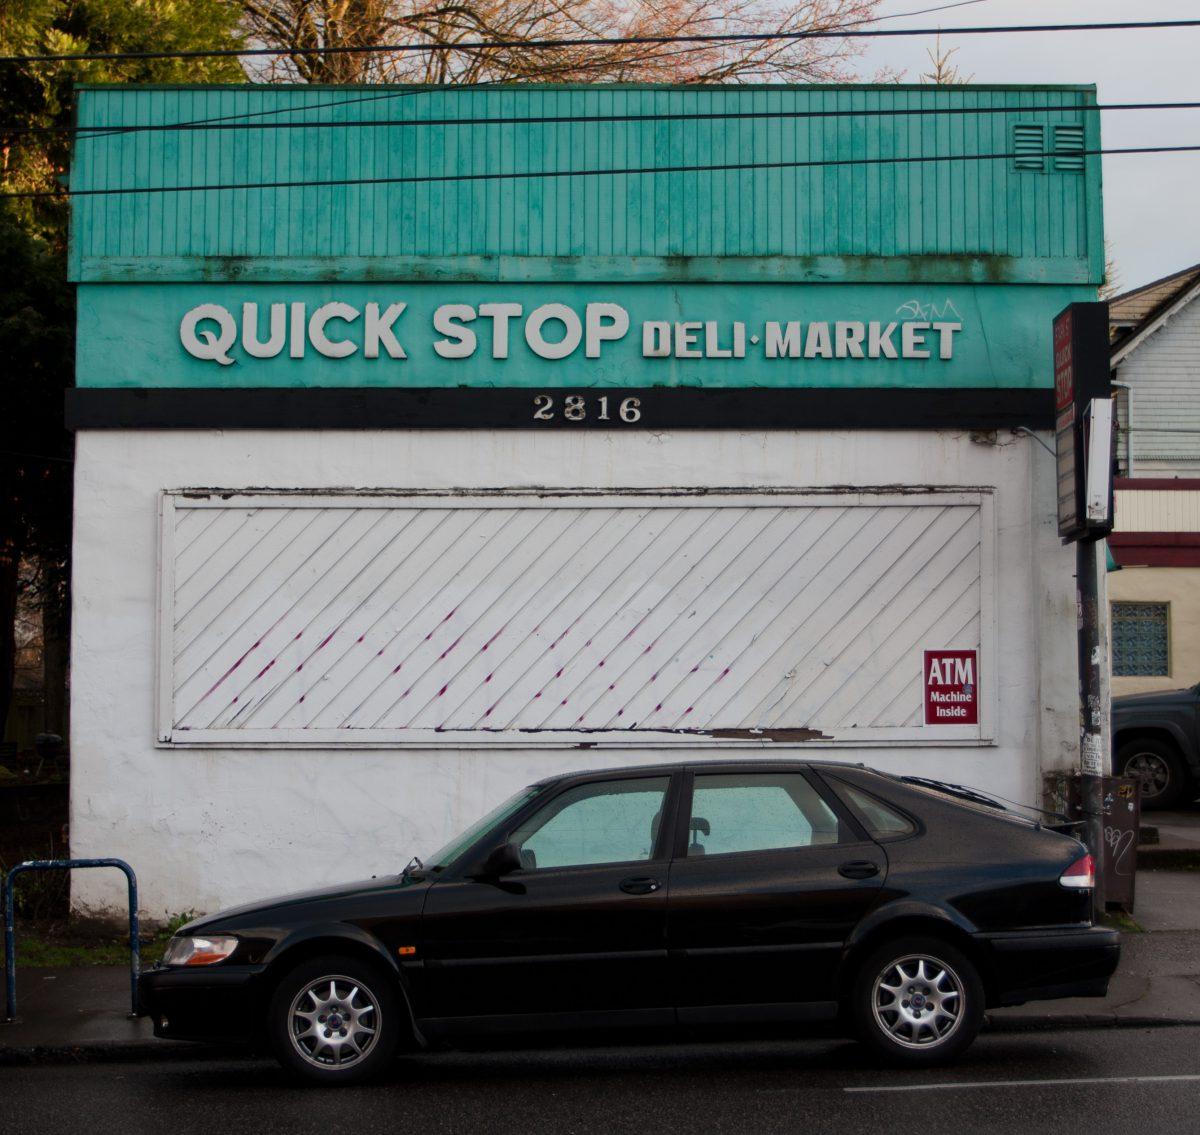 sign, vehicle, building, shop